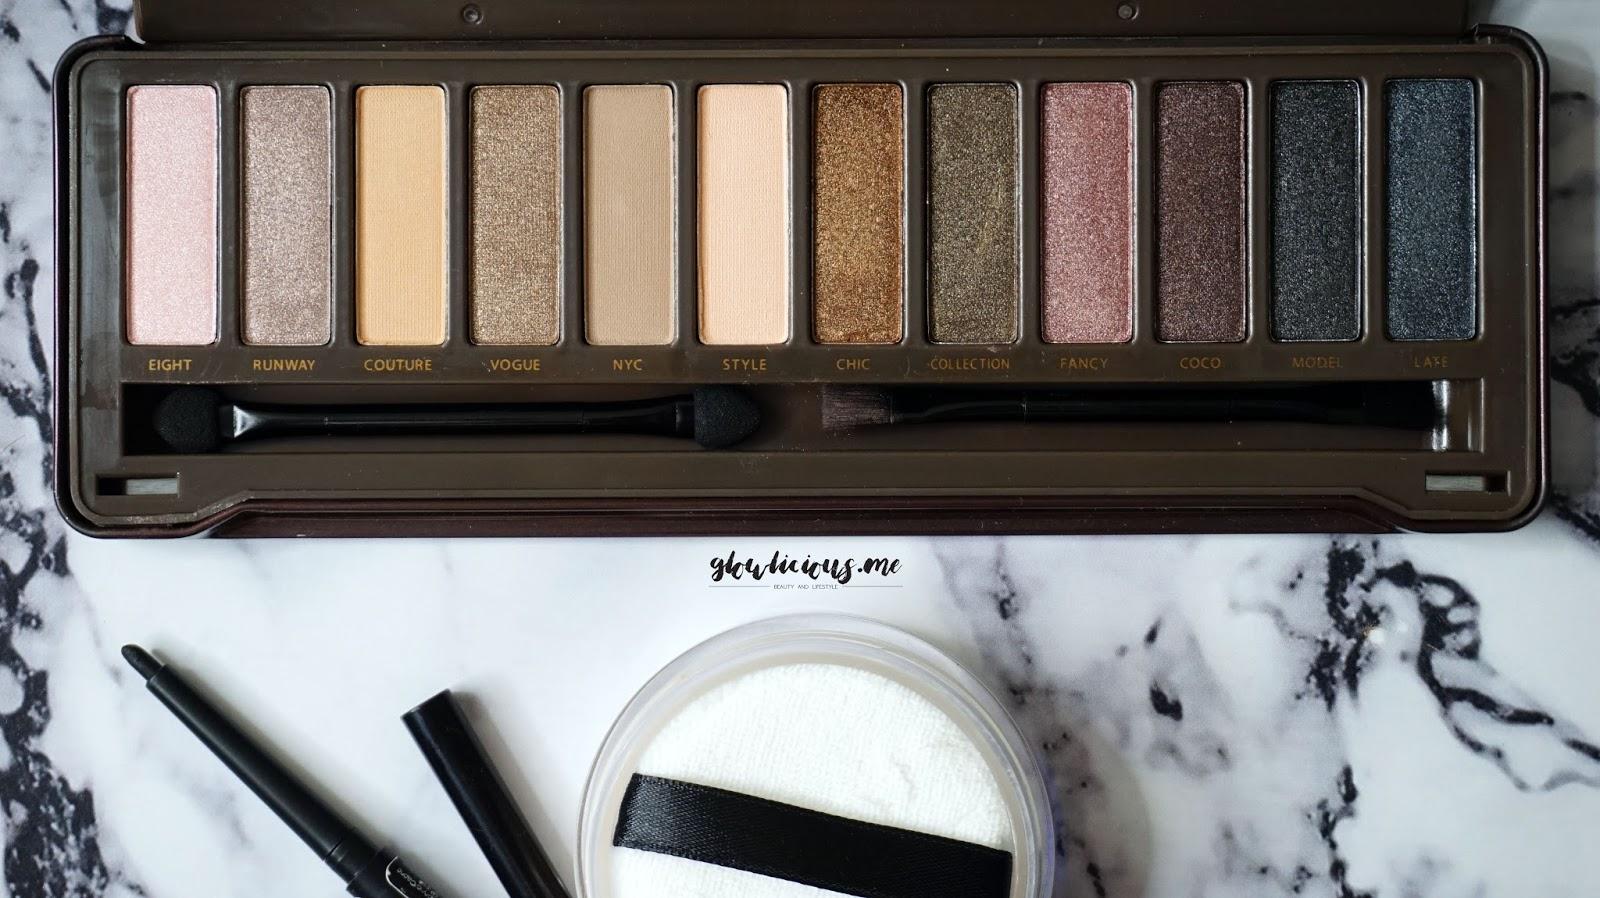 BYS Nude Eyeshadow Palette, dilengkapi dengan kaca dan 2 aplikator eyeshadow